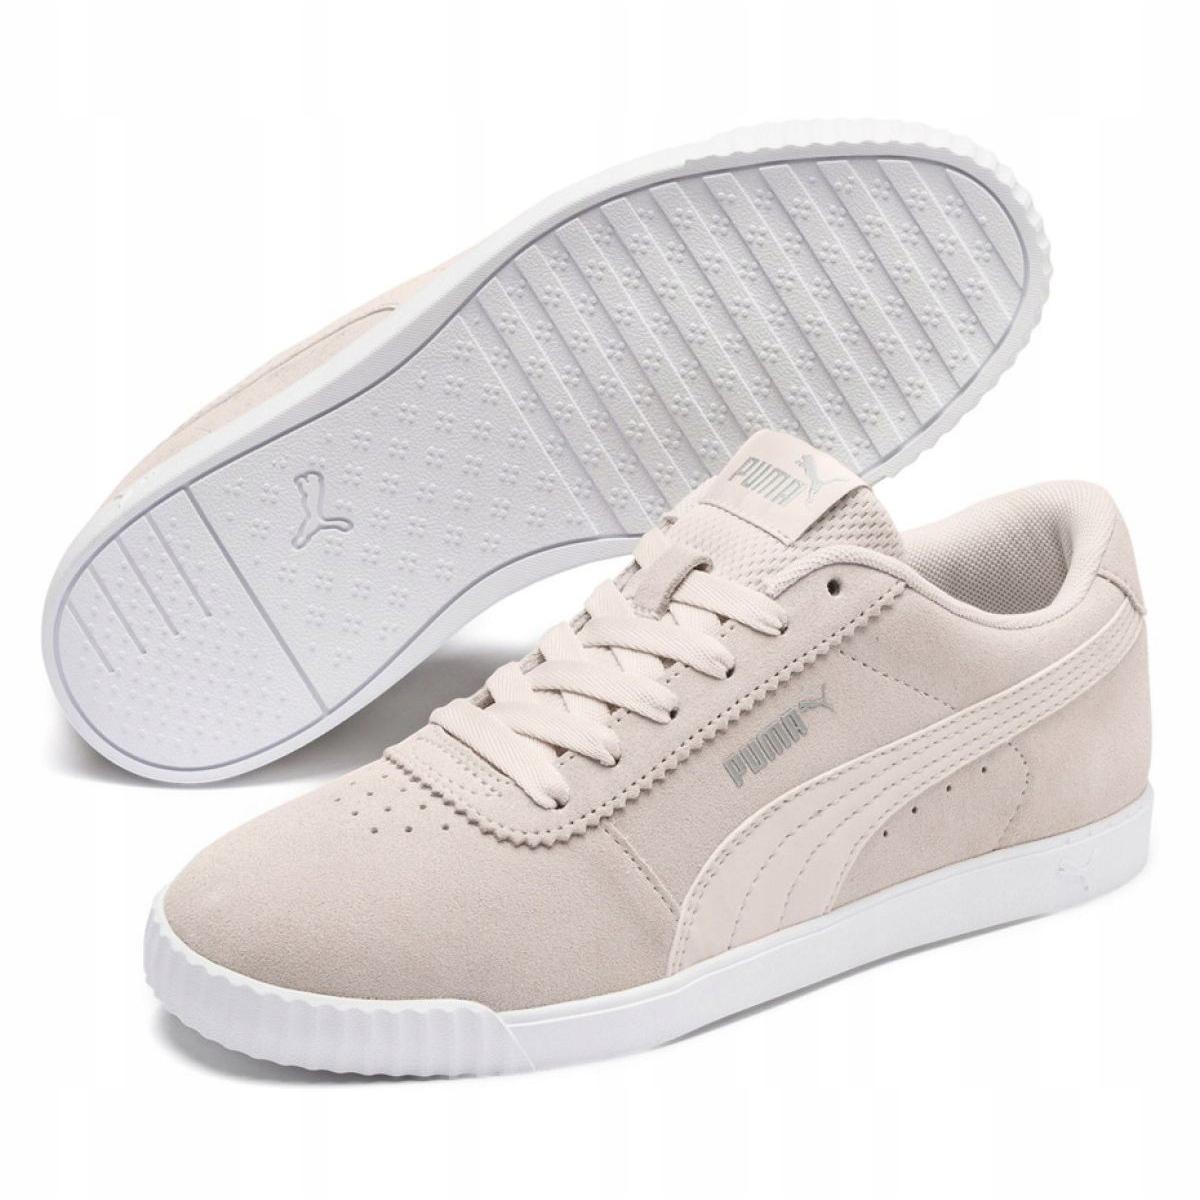 cerco scarpe puma